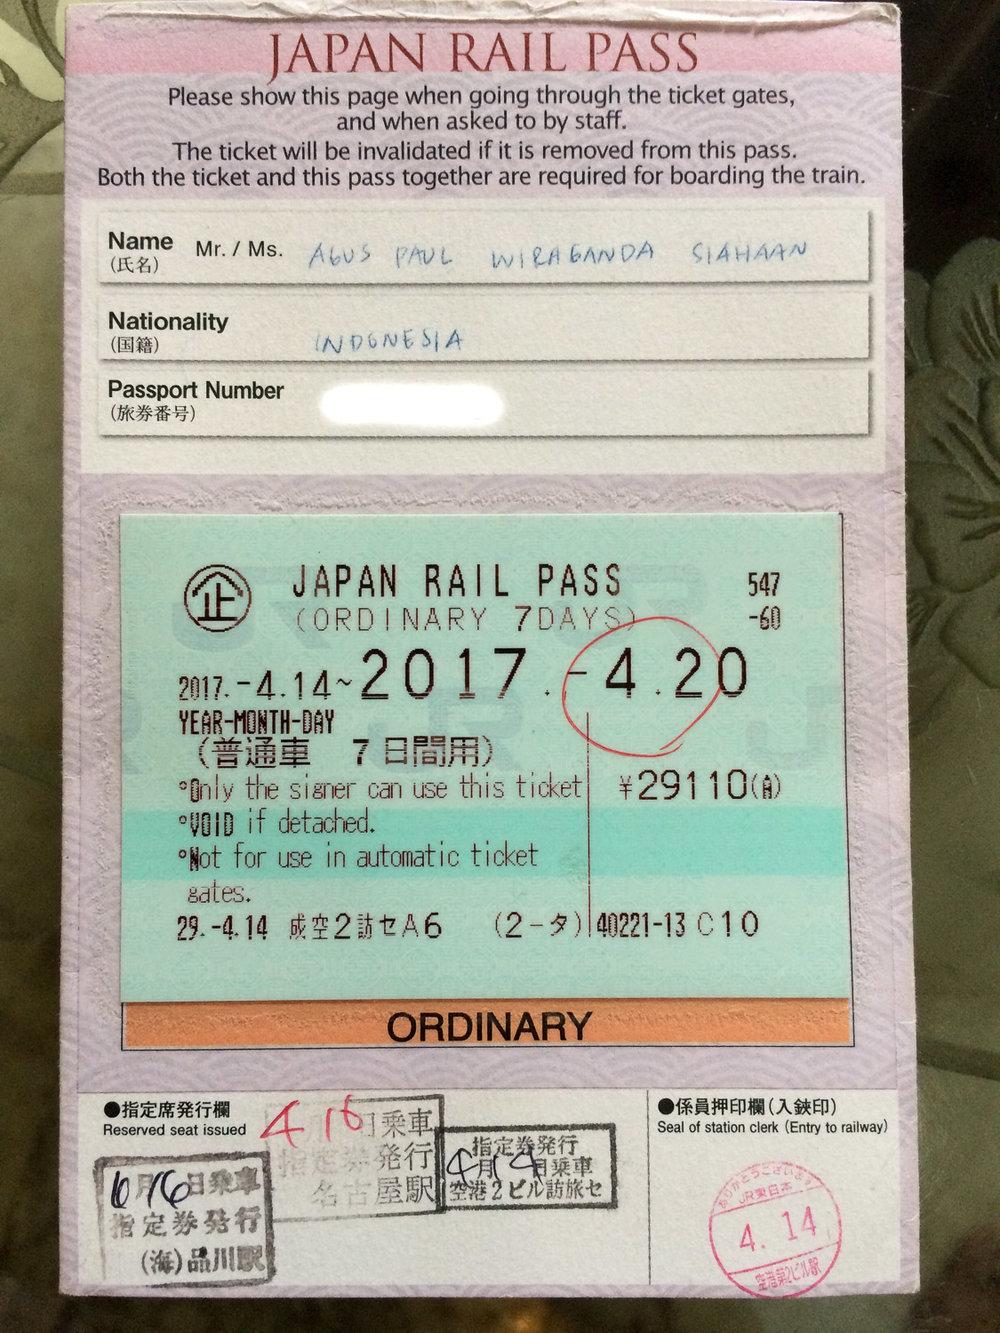 JR Pass (Back)